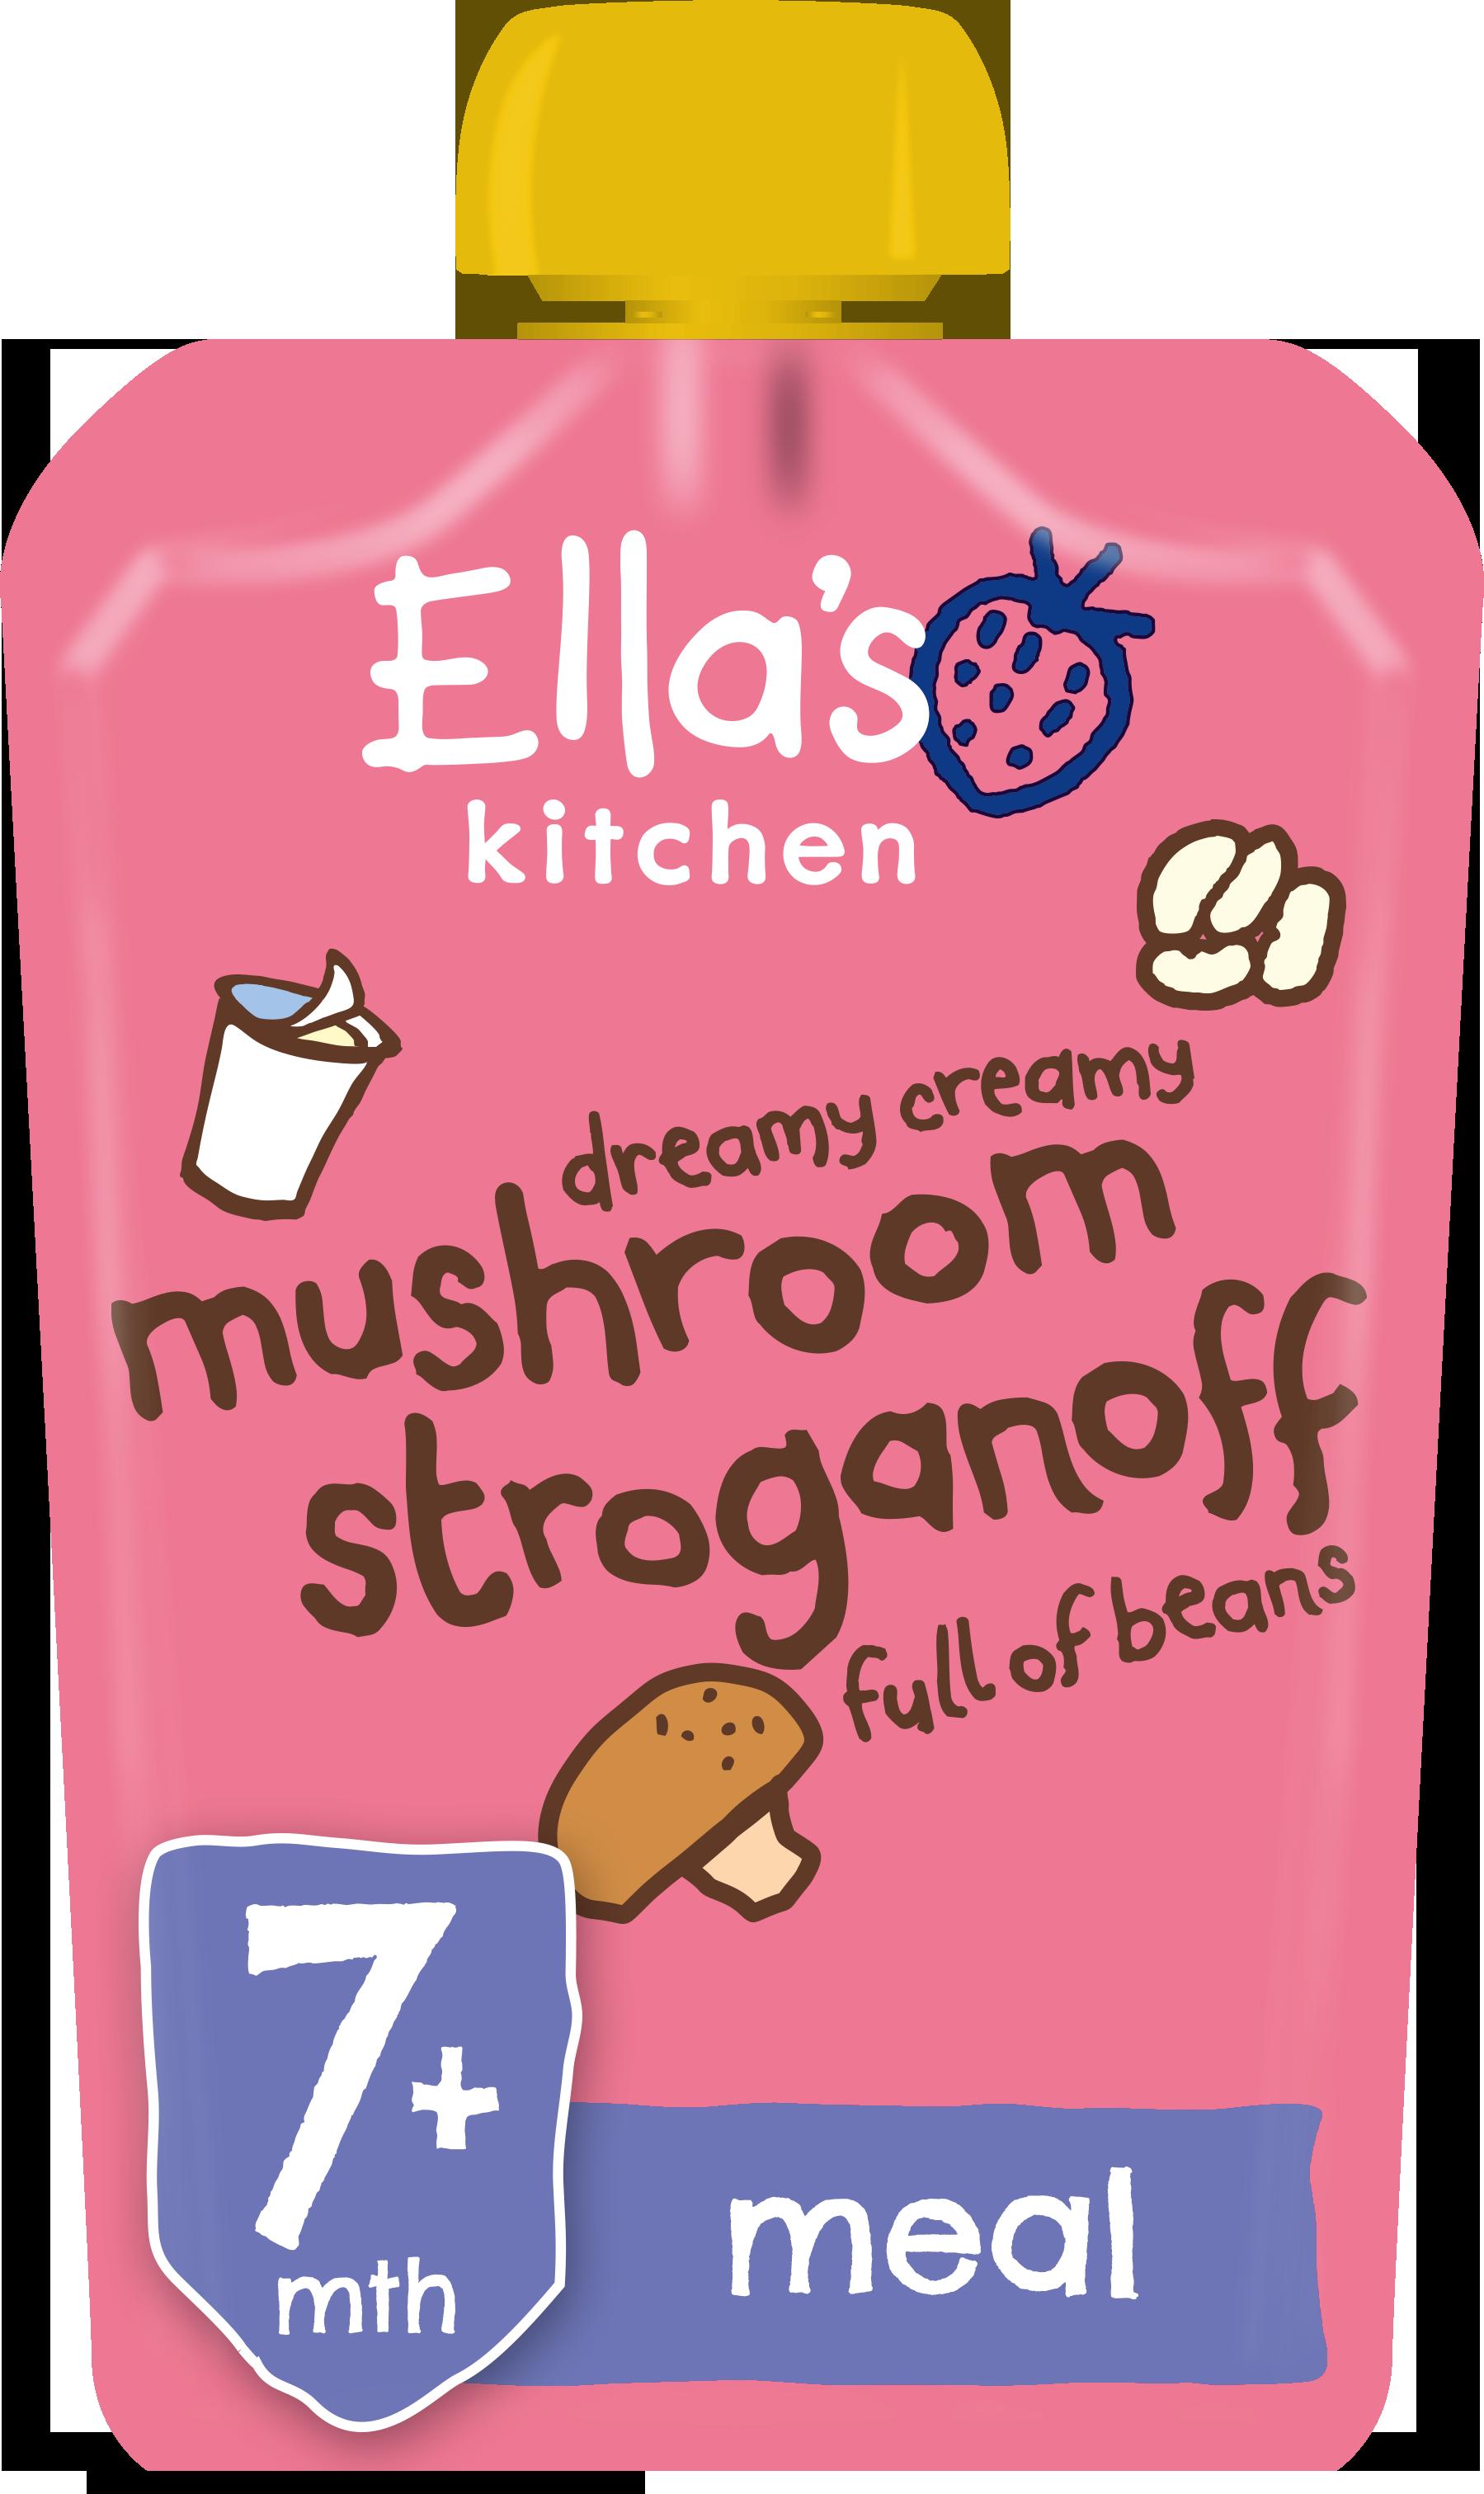 Ellas kitchen mushroom stroganoff 7 months front of pack O